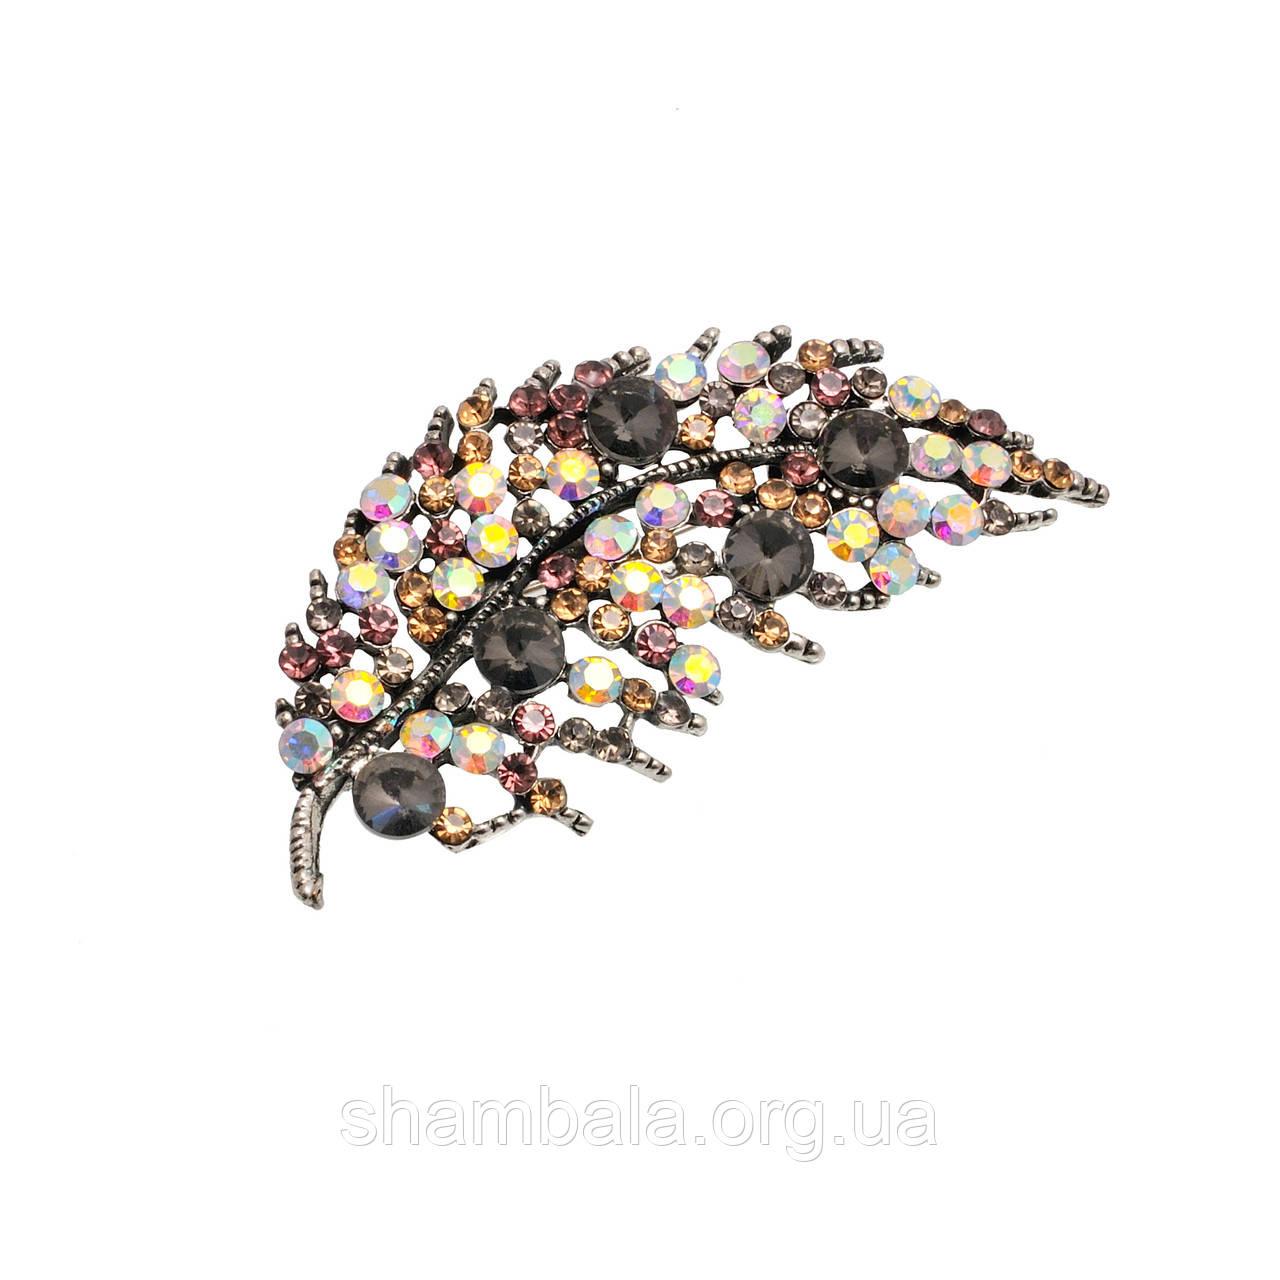 "Брошь Fashion Jewerly ""Leaf multi-colored stones"" (0057200)"